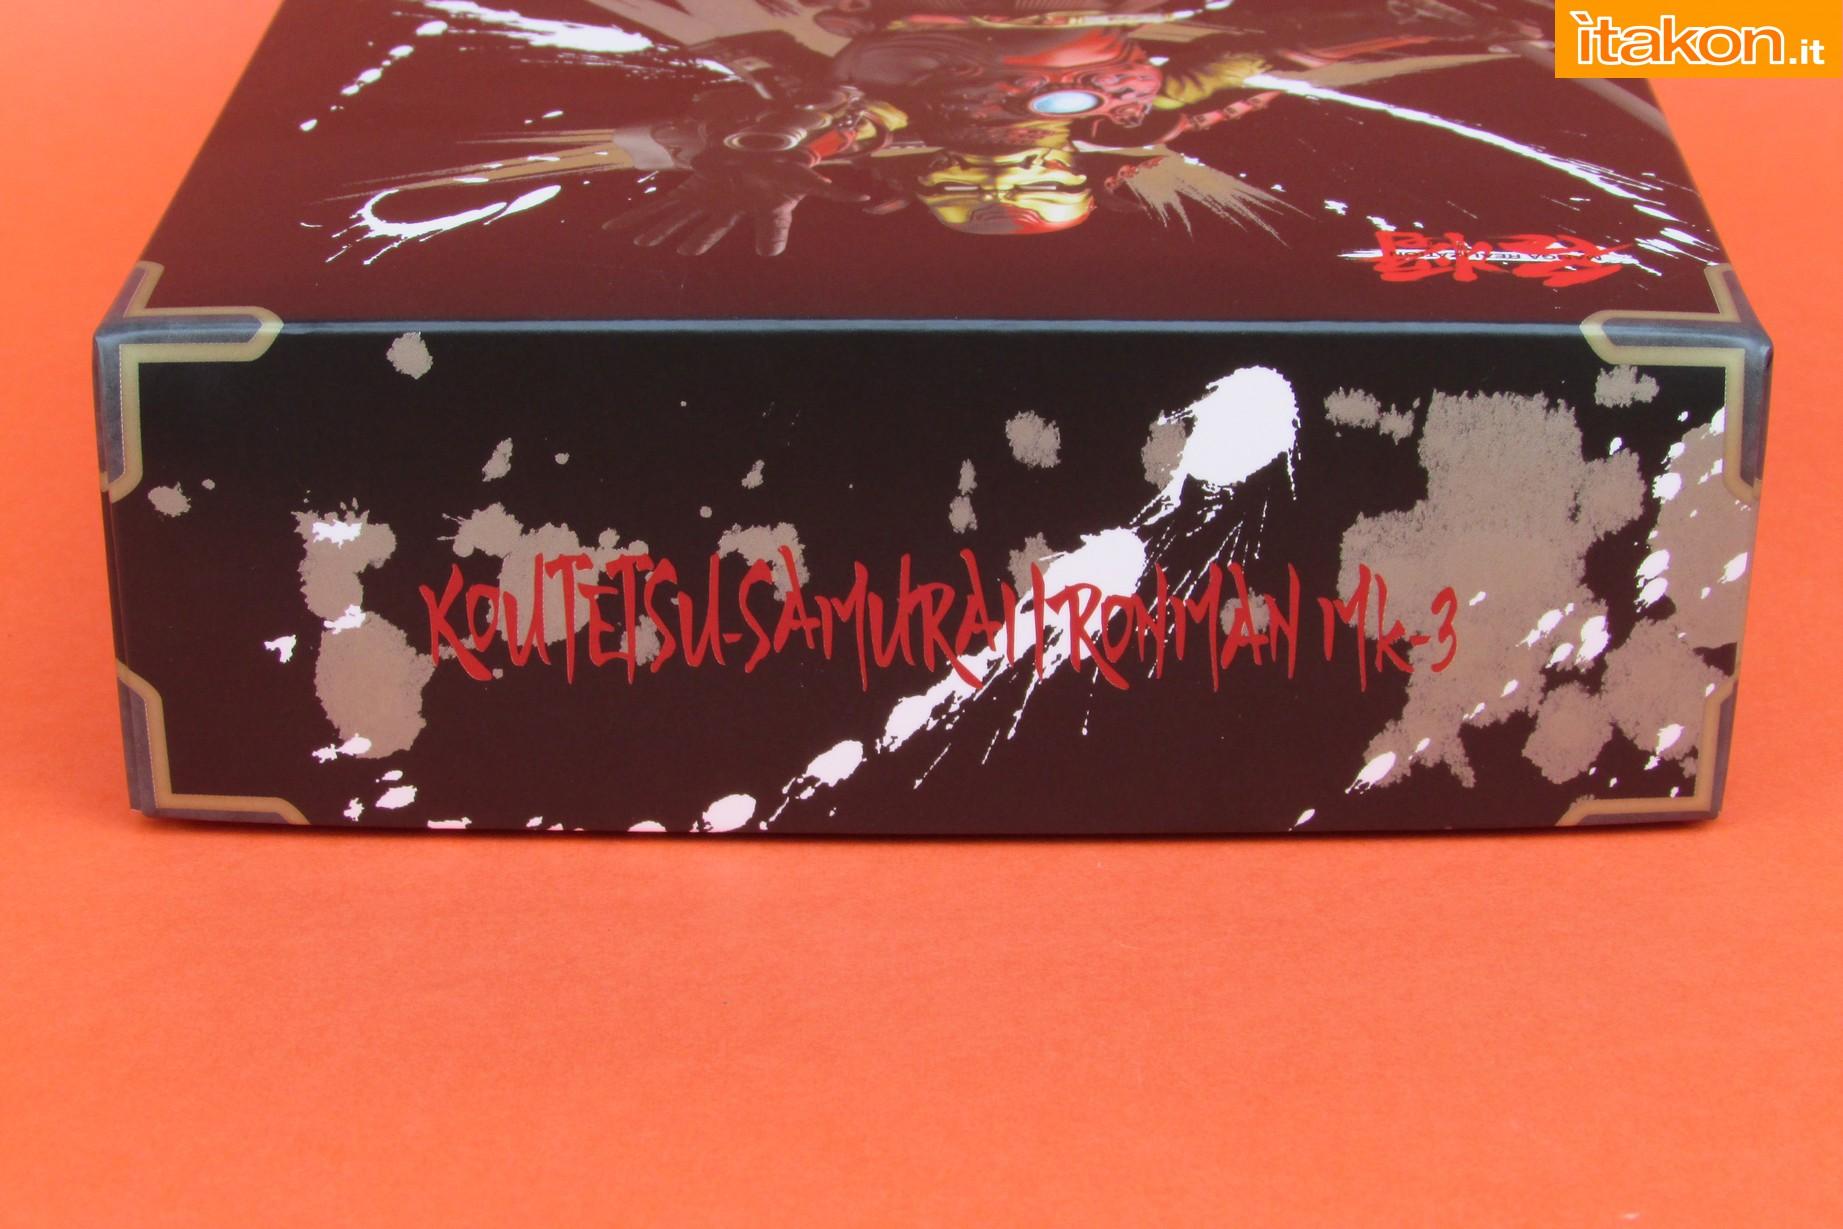 Link a Marvel Comics Koutetsu Samurai Iron Man Mark 3 Meishou MANGA REALIZATION review Bandai Itakon.it03